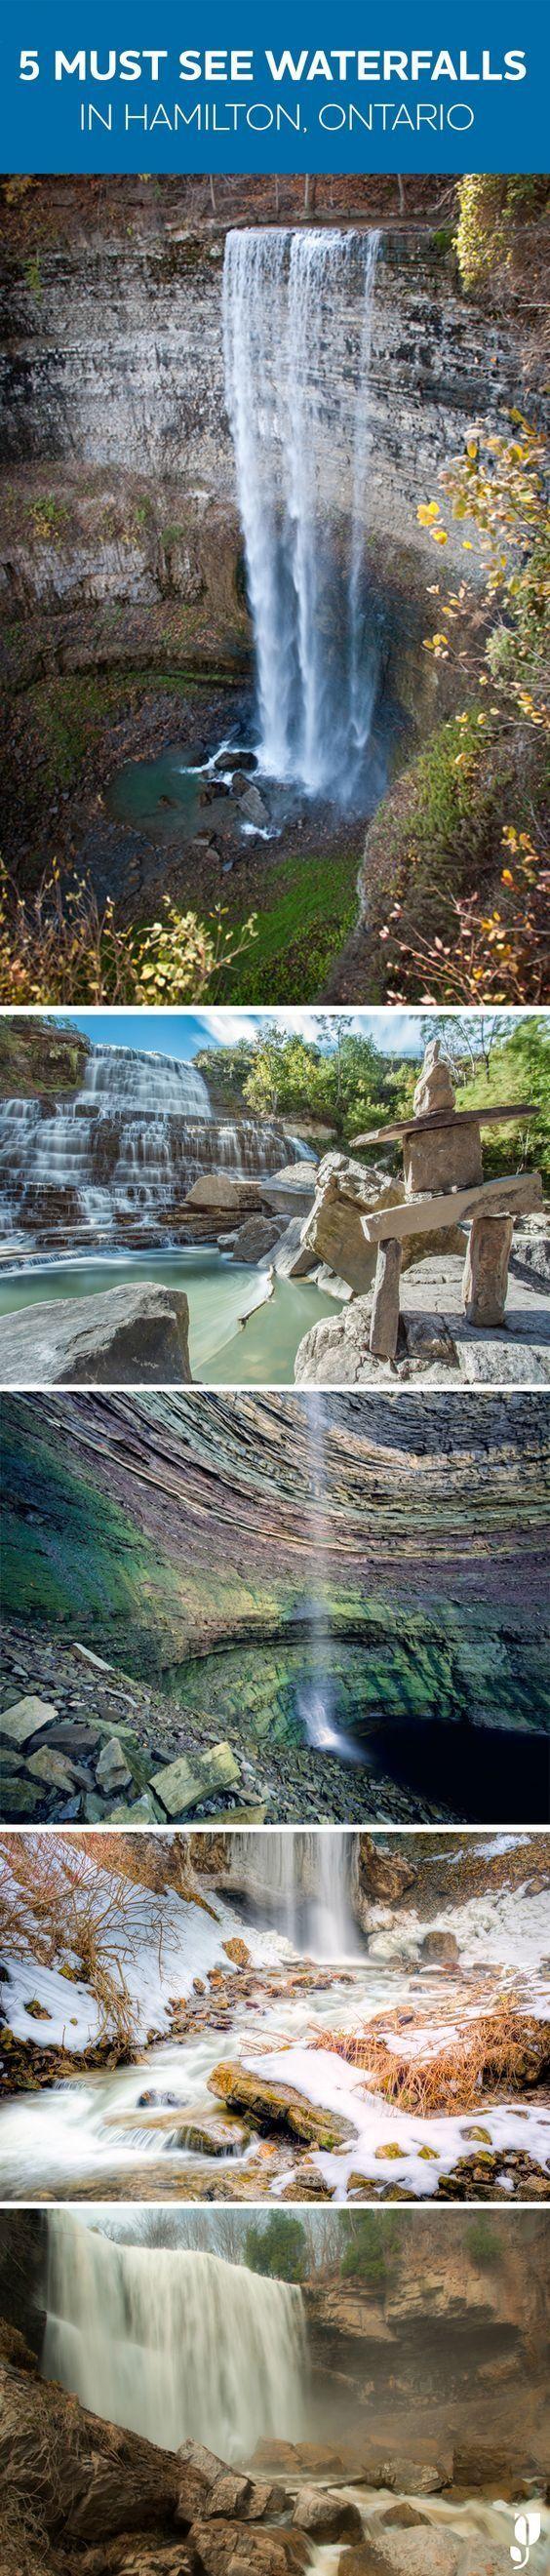 5 must-see waterfalls in Hamilton, Ontario.